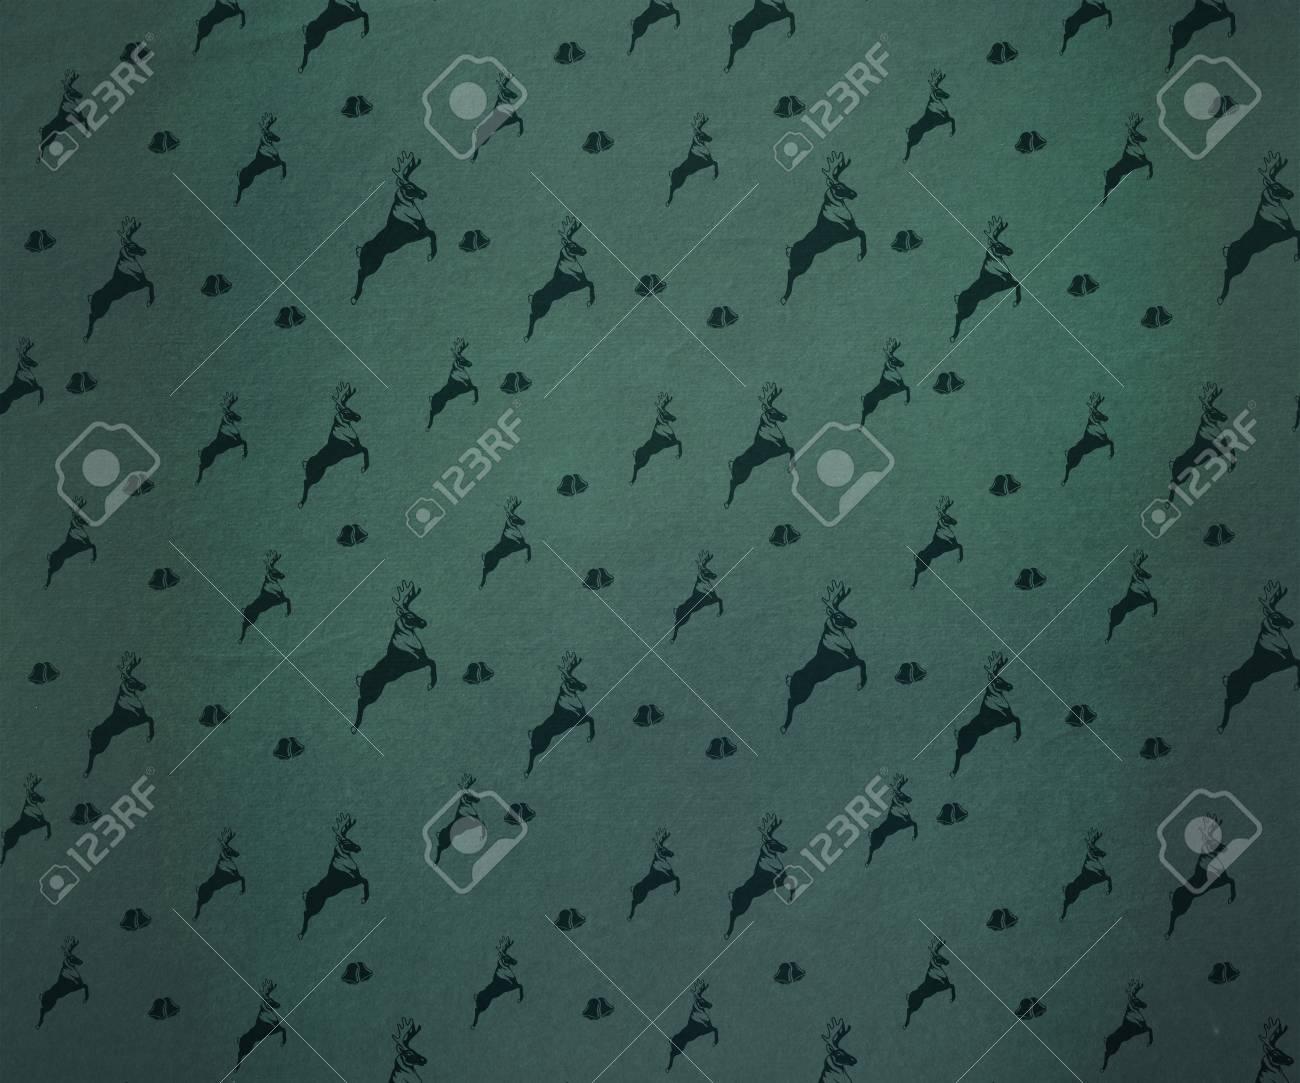 Behang Met Patroon : Digitaal gegenereerde reindeer patroon behang royalty vrije foto